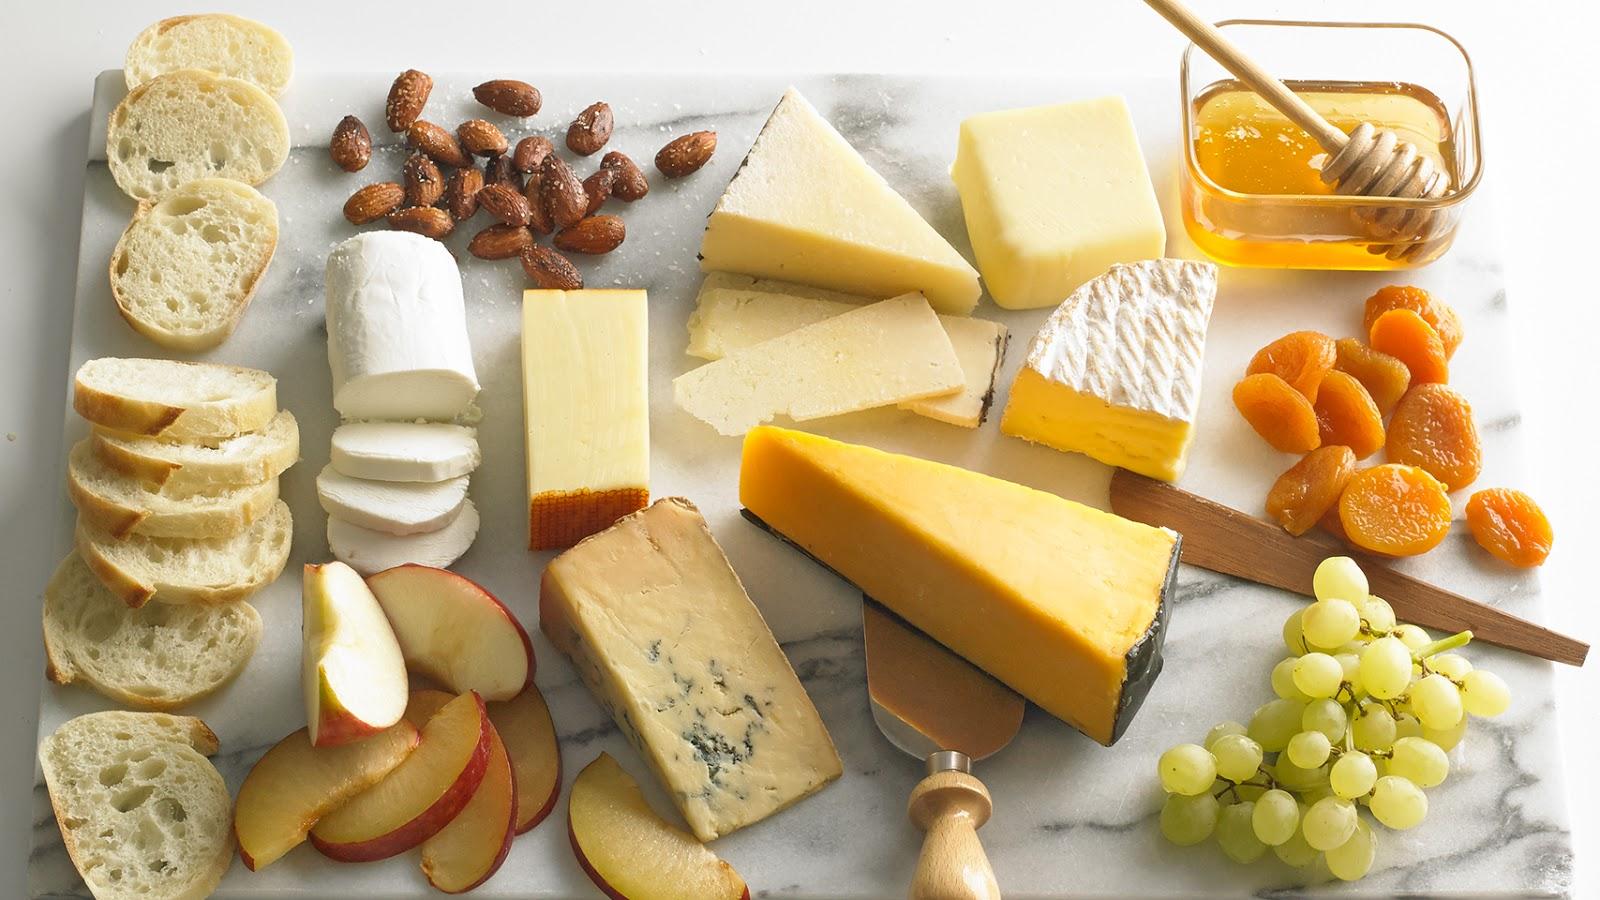 Cheese health benefits